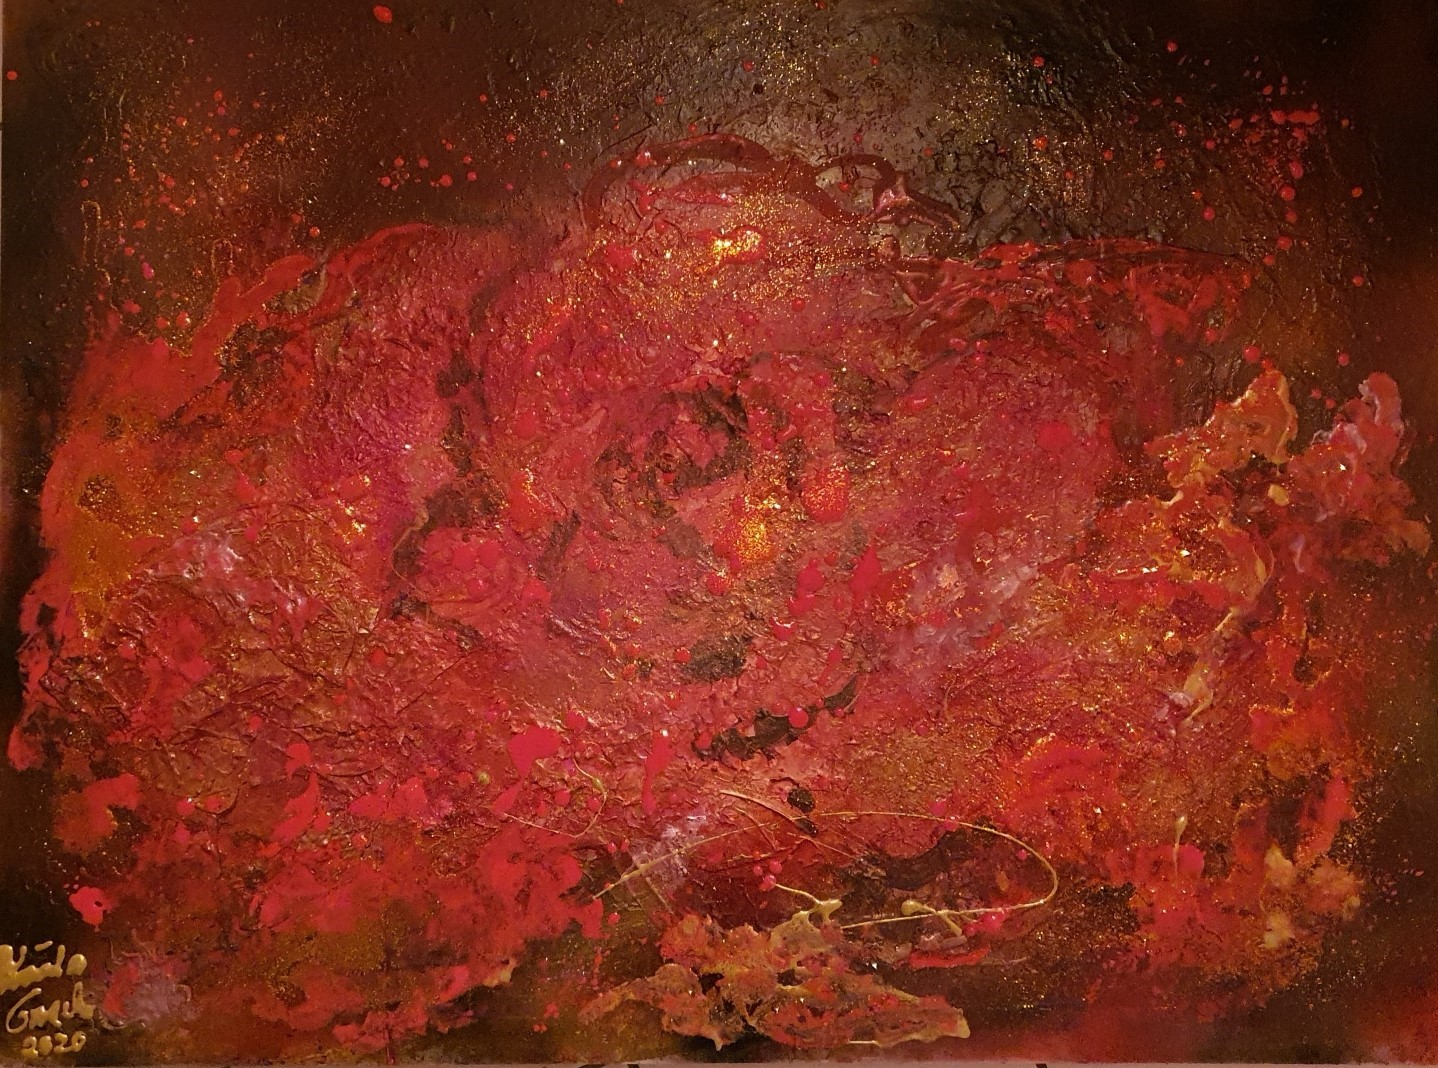 Lovestory on Christmas (Technik: Acryl/Mixed Media on Canvas) 60 X 80 X 1,5 cm)